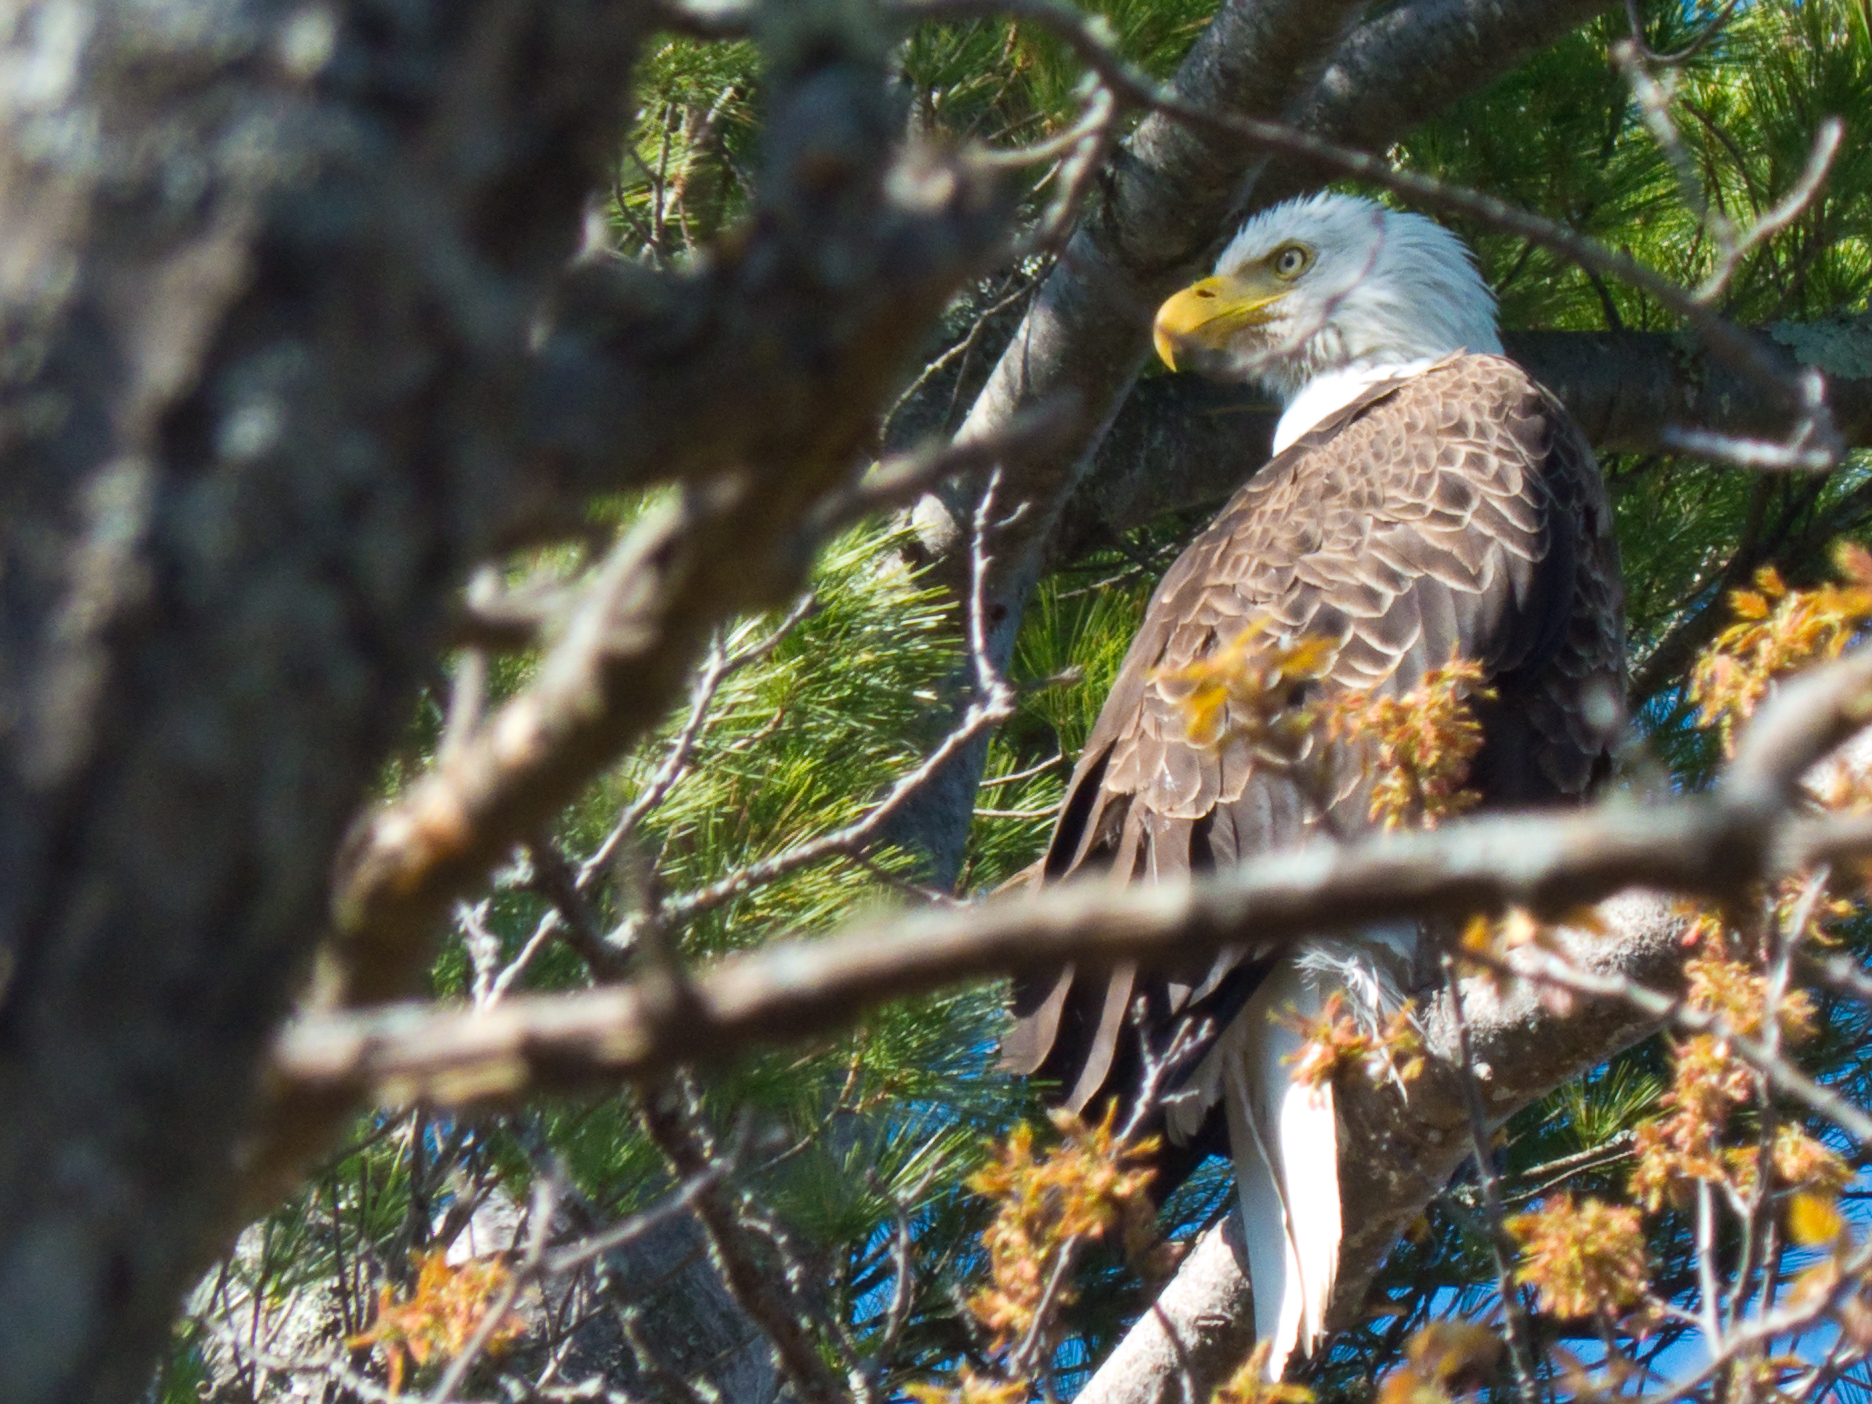 Keeping an eye on the nest